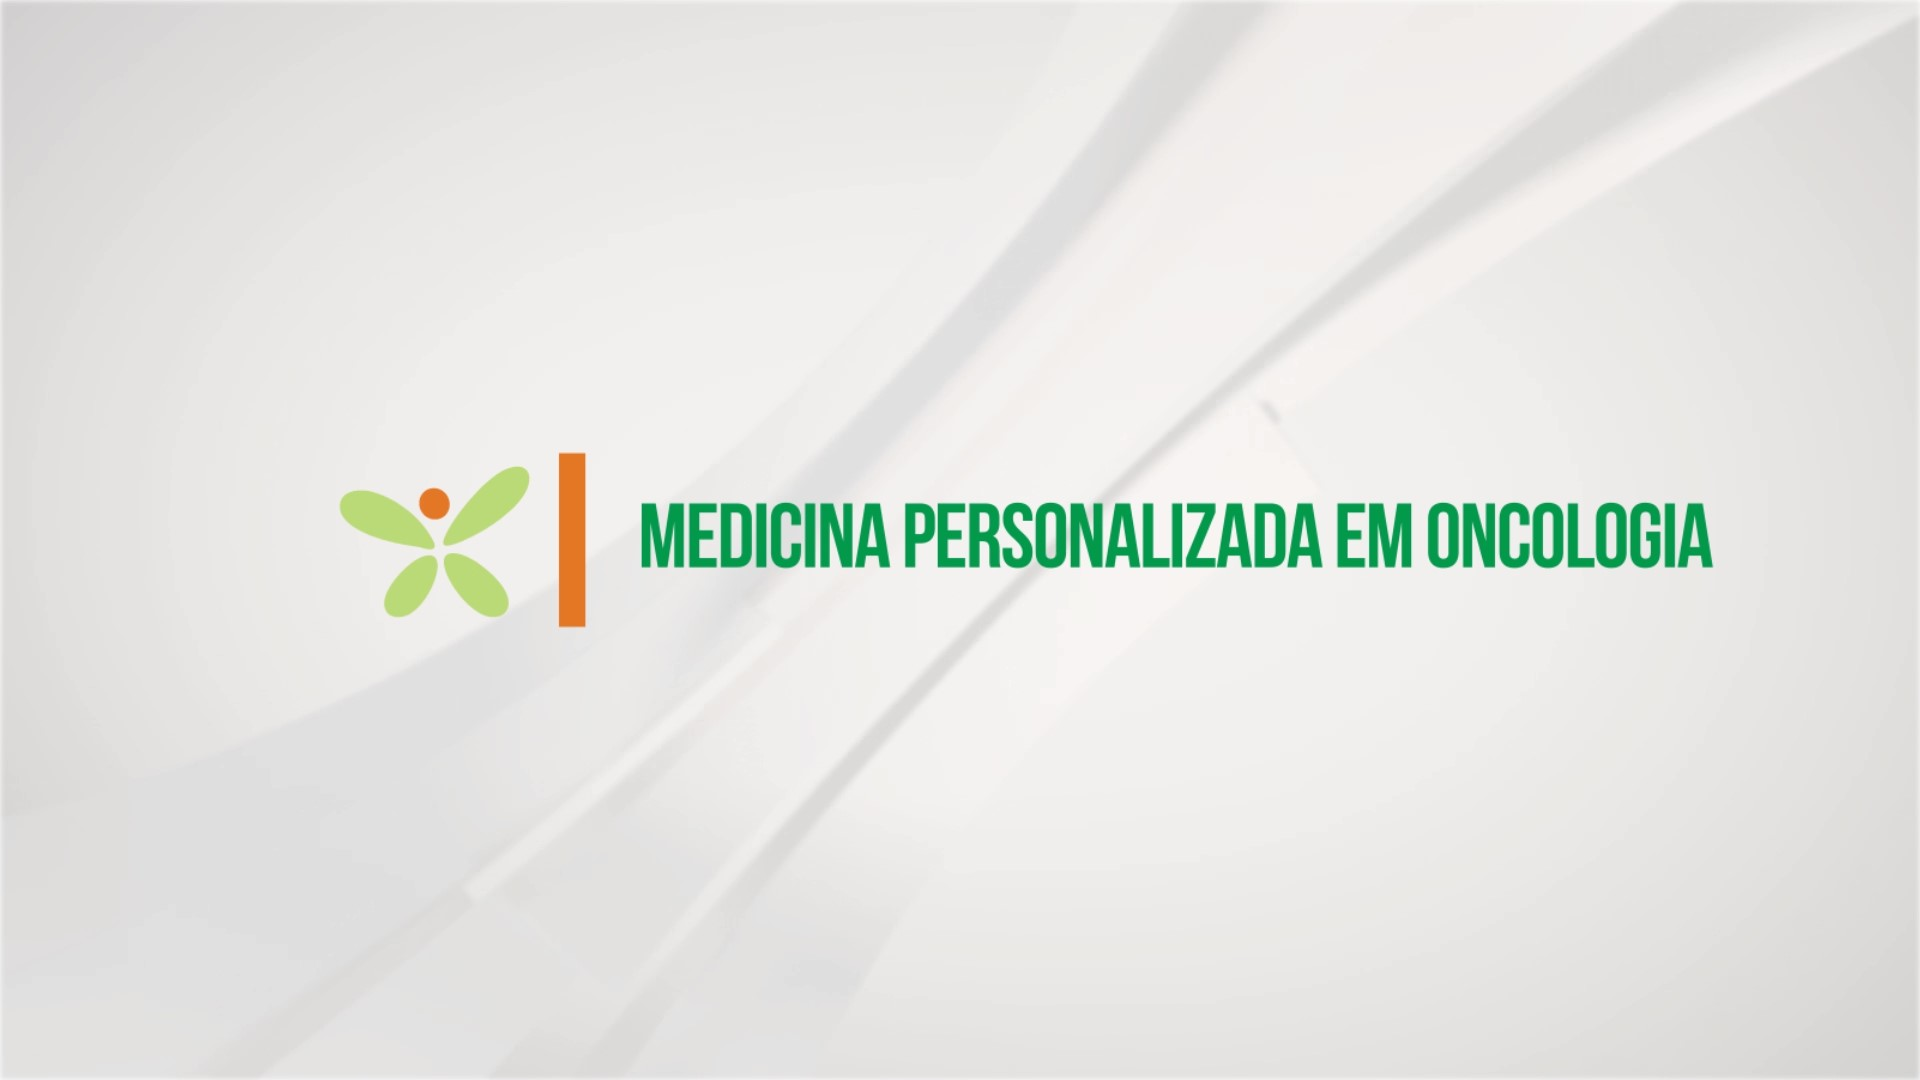 Medicina personalizada em oncologia – Dra. Maria Cecília de Lucena Araújo